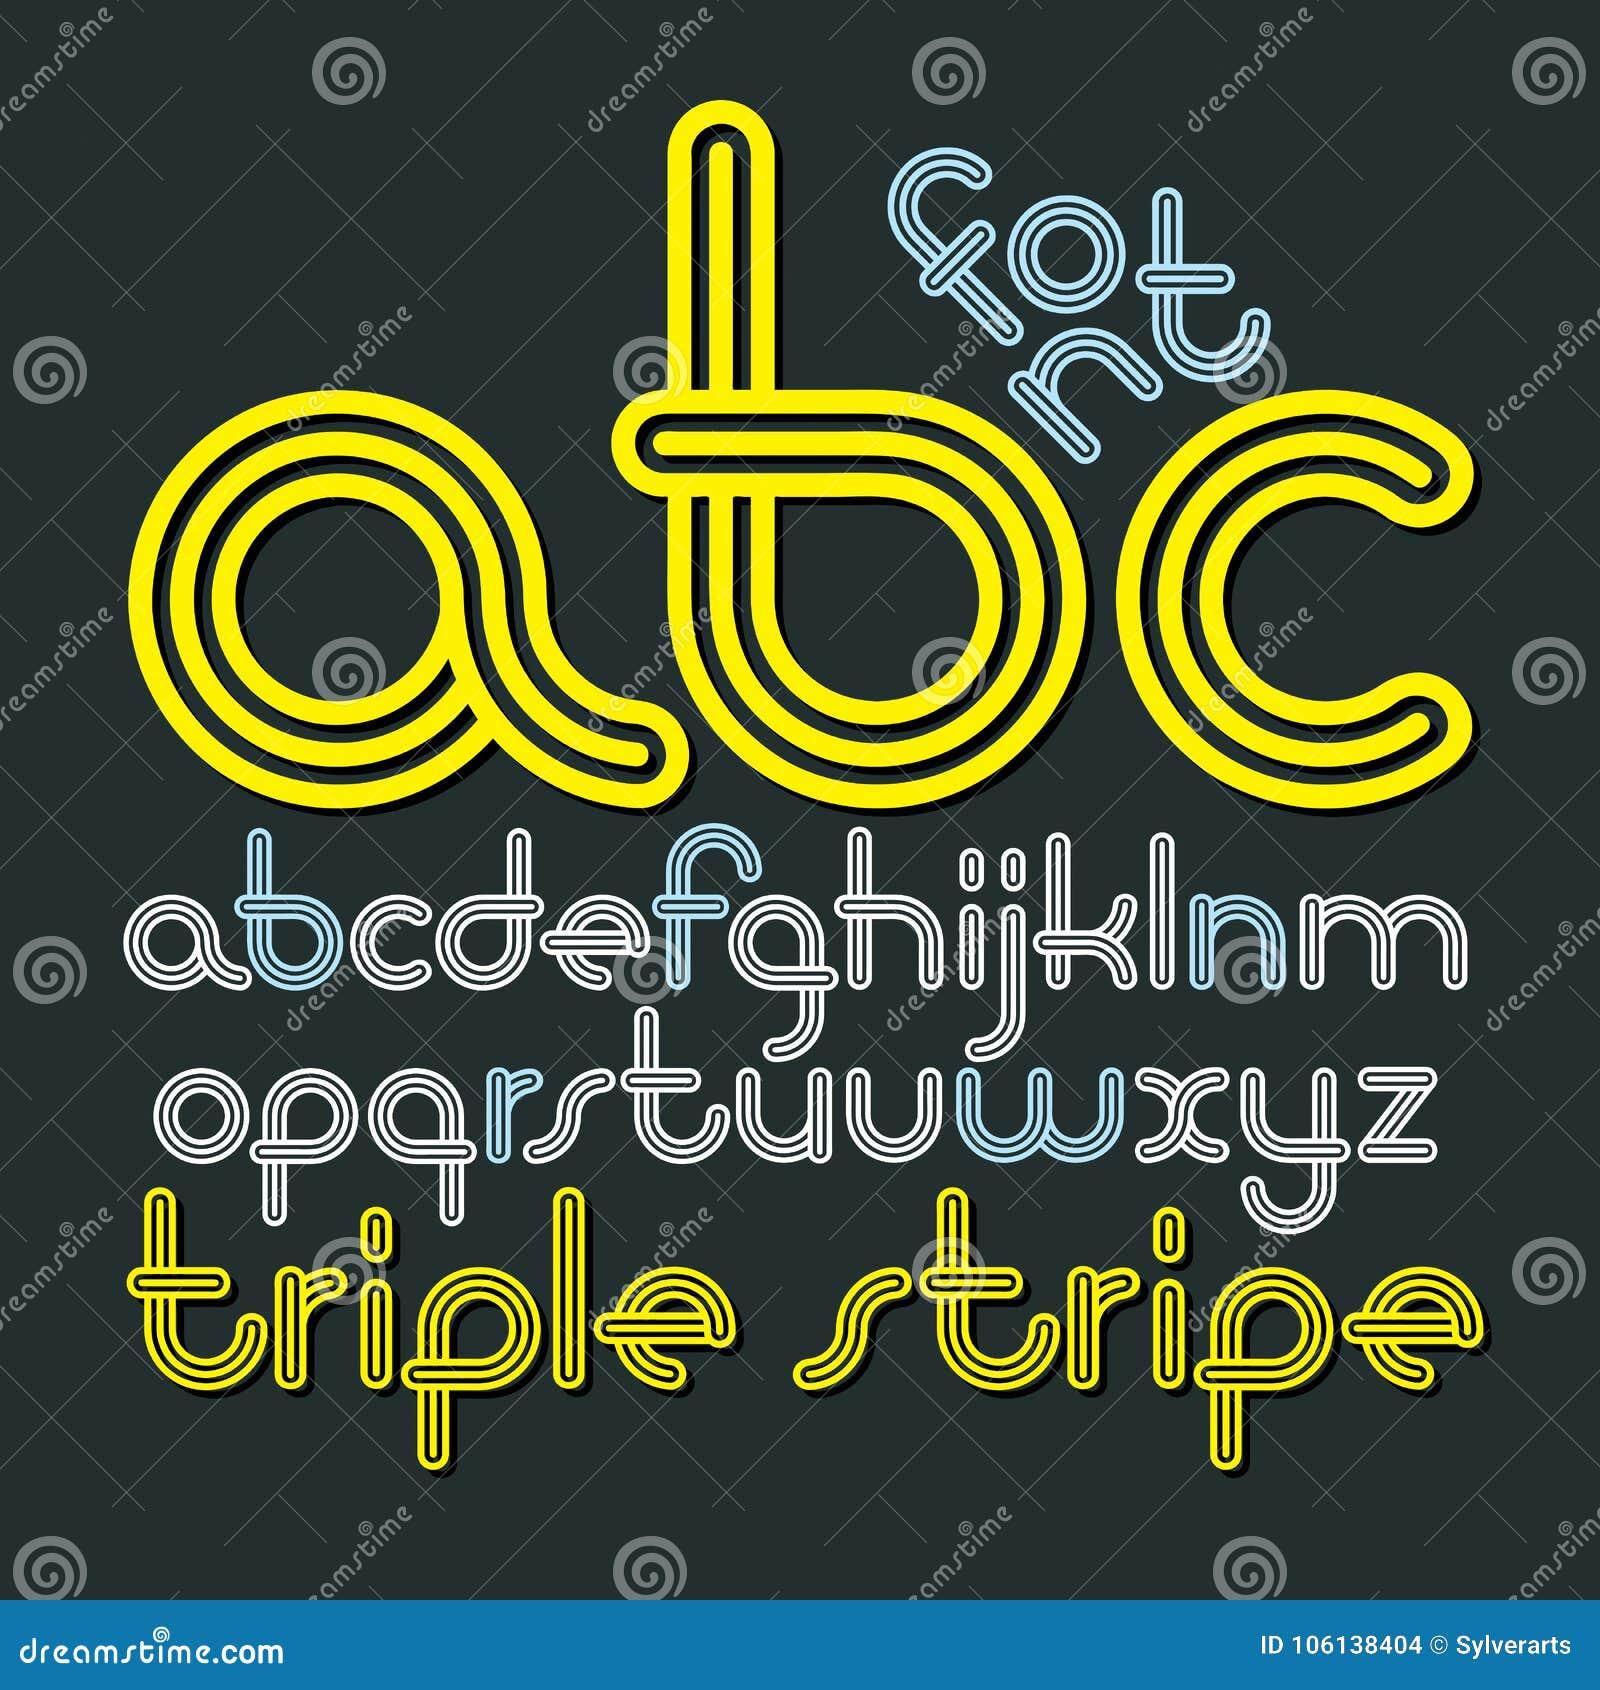 Abc Creation dedans vector lowercase funky disco alphabet letters, abc set. trendy f